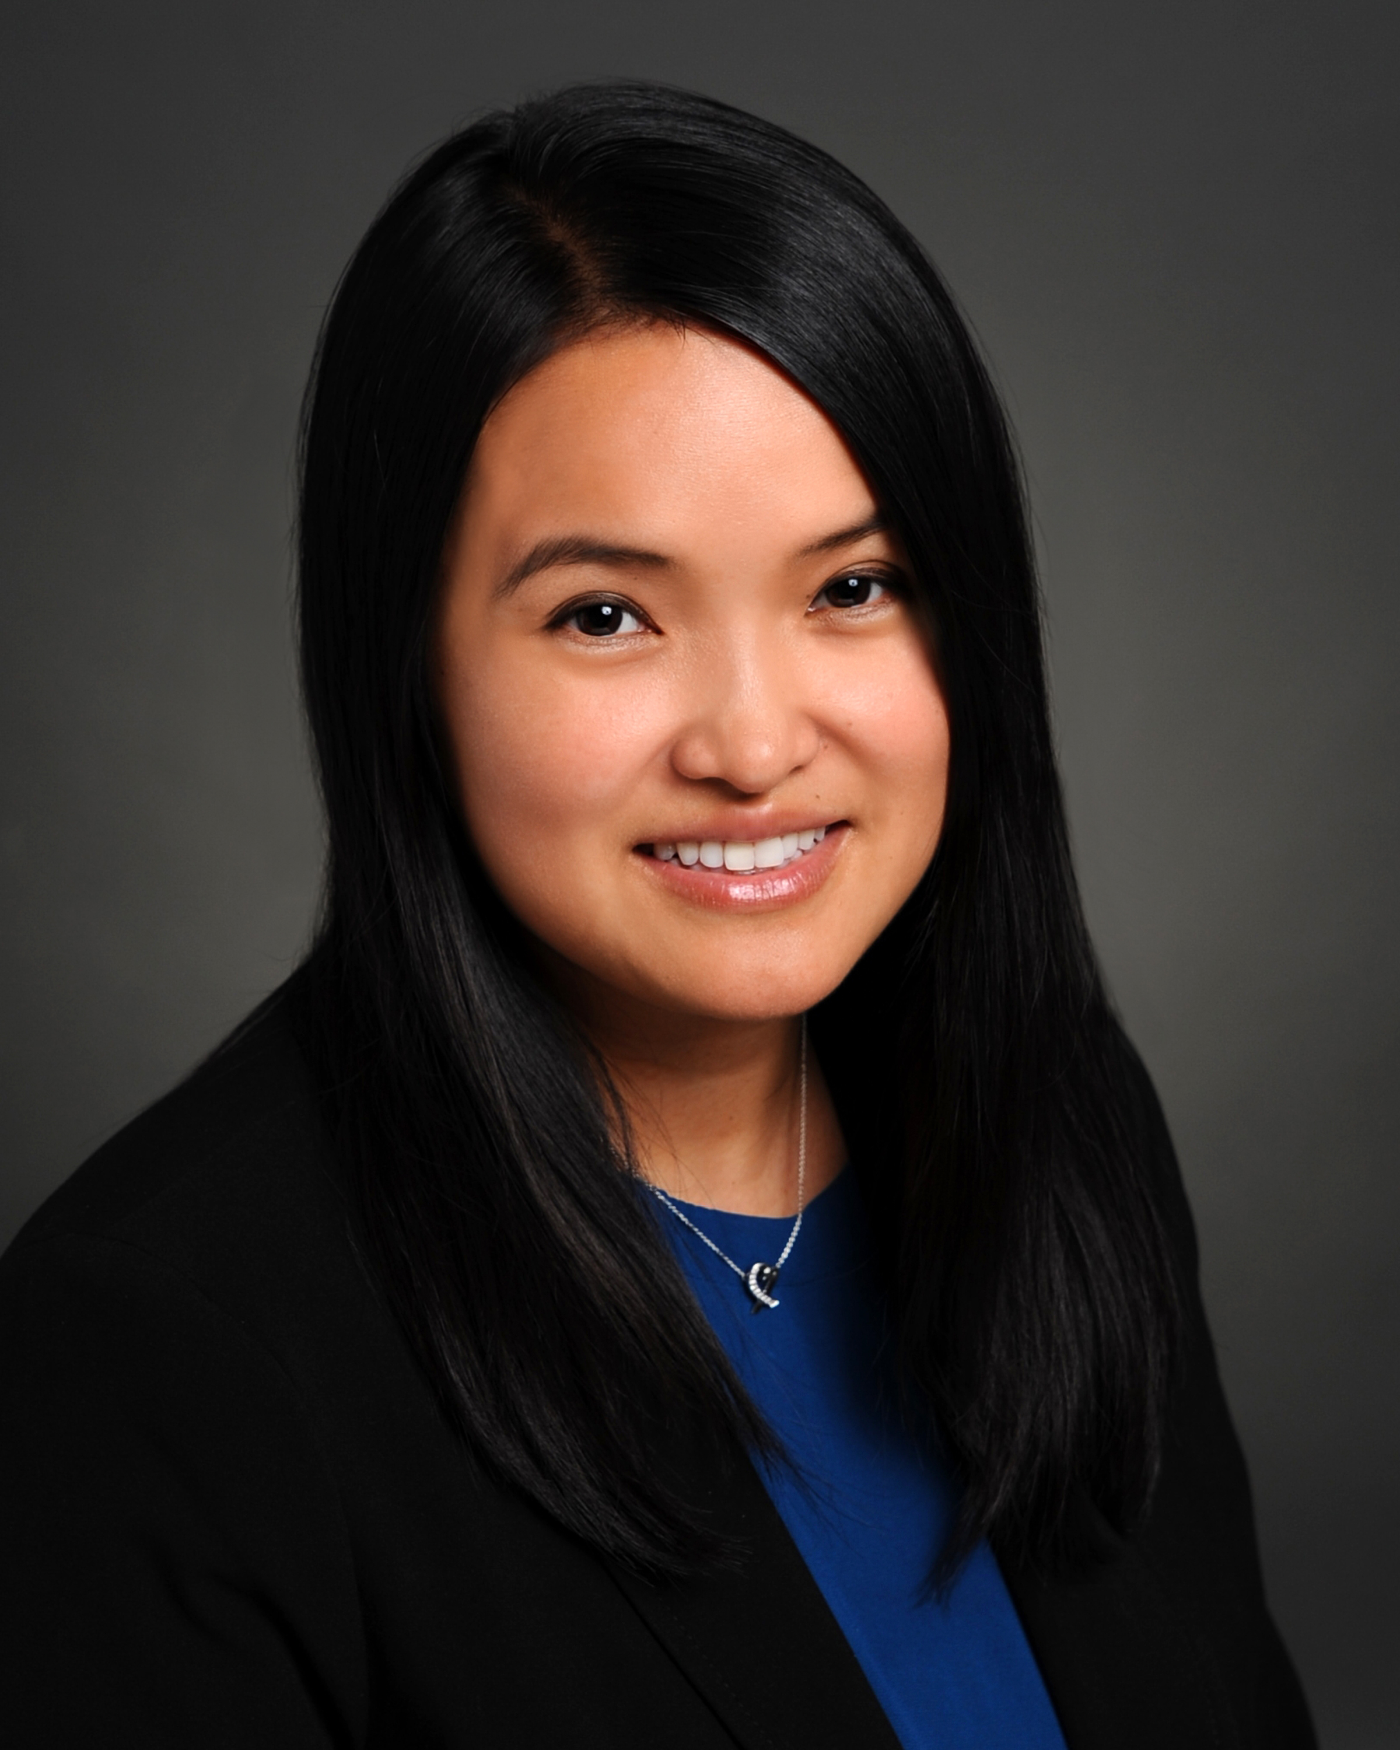 Vivian Aranez MD professional